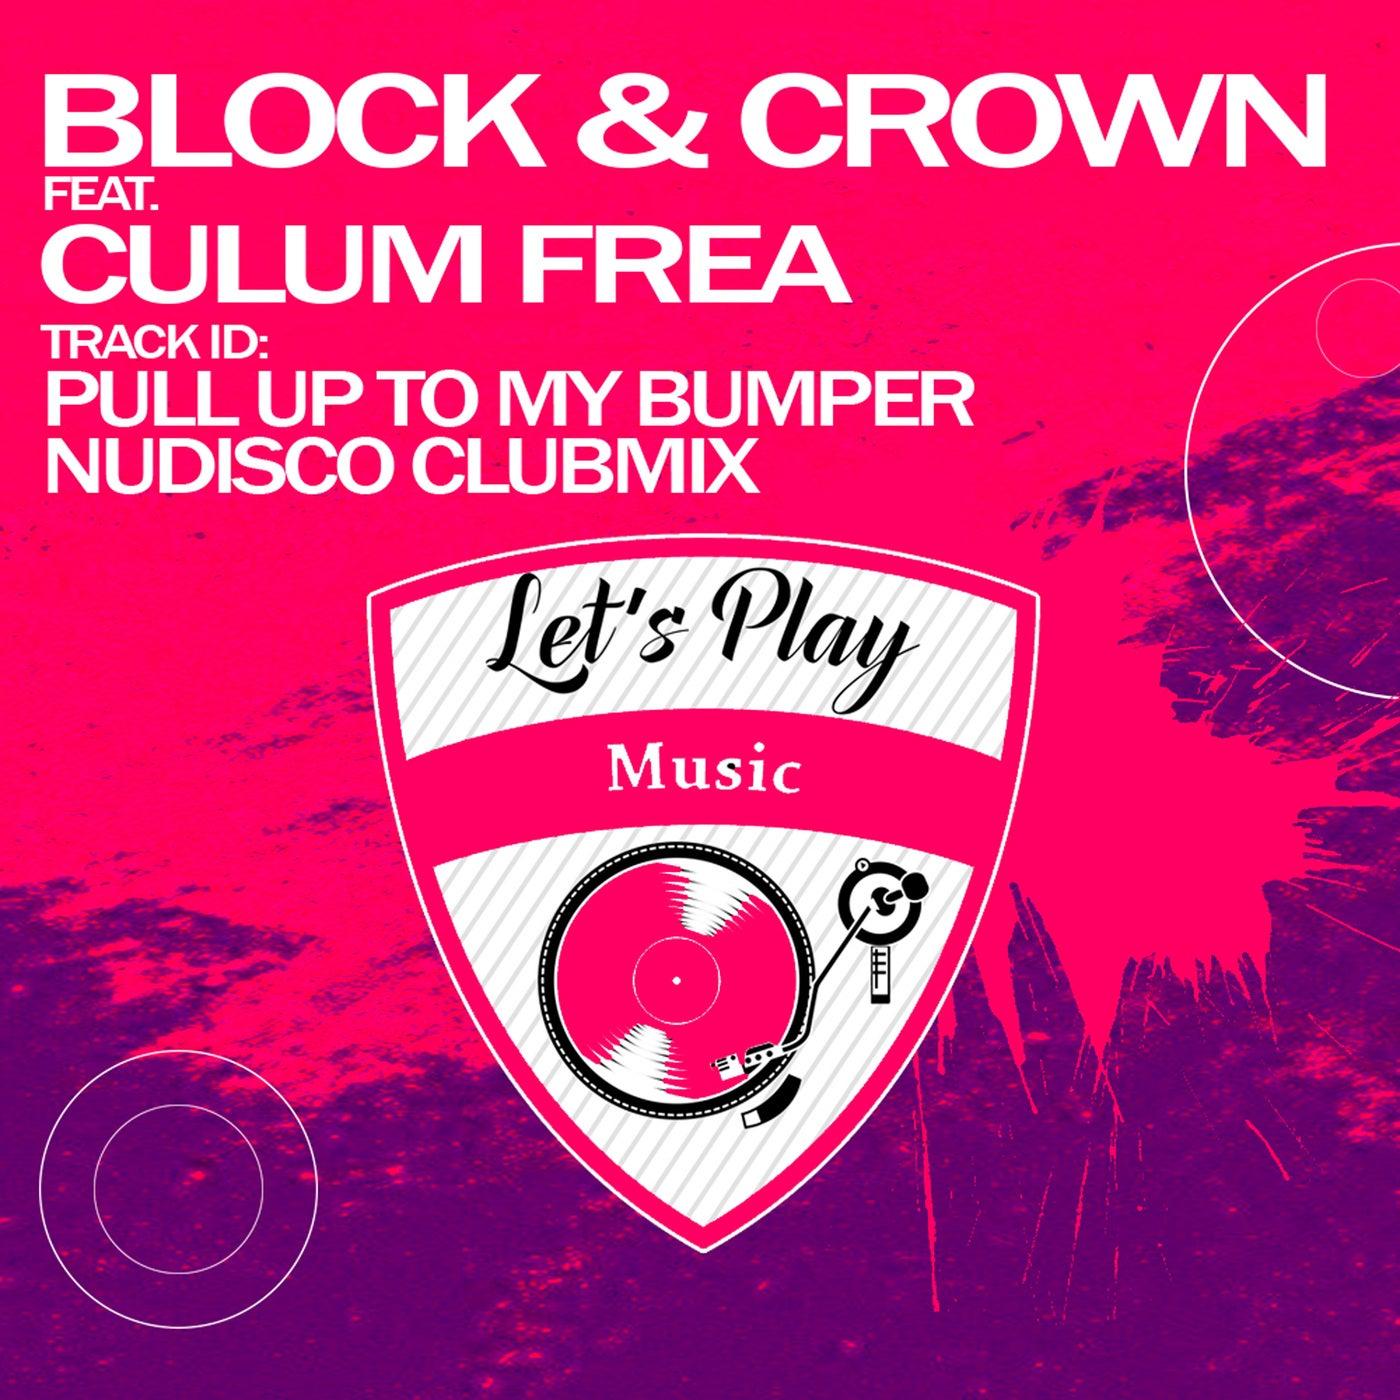 Pull up to My Bumper feat. Culum Frea (Nudisco Clubmix)